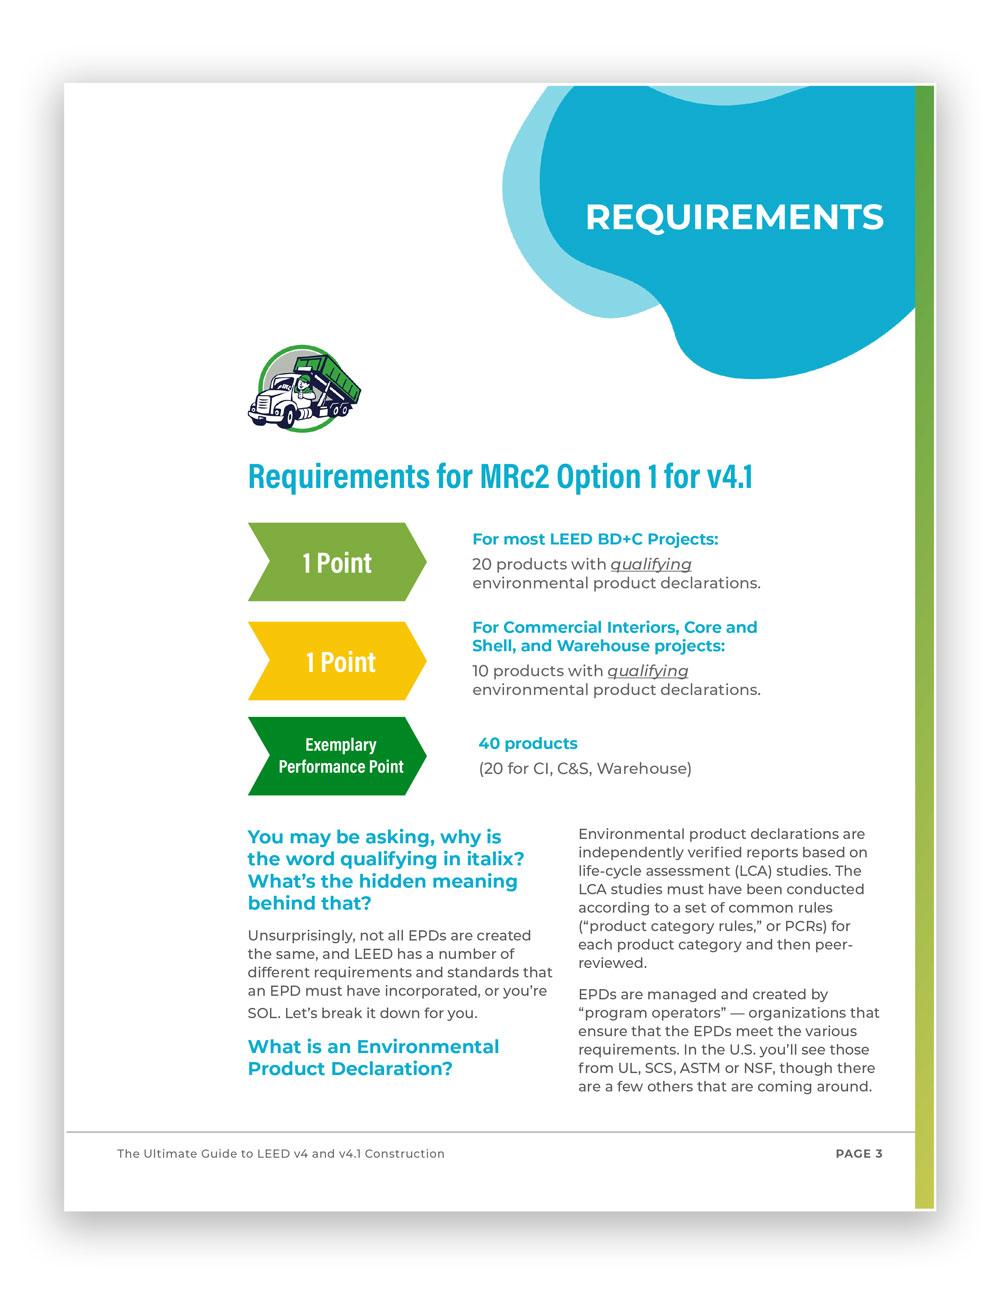 mrc2-option1-requirements-LEED-greenbadger